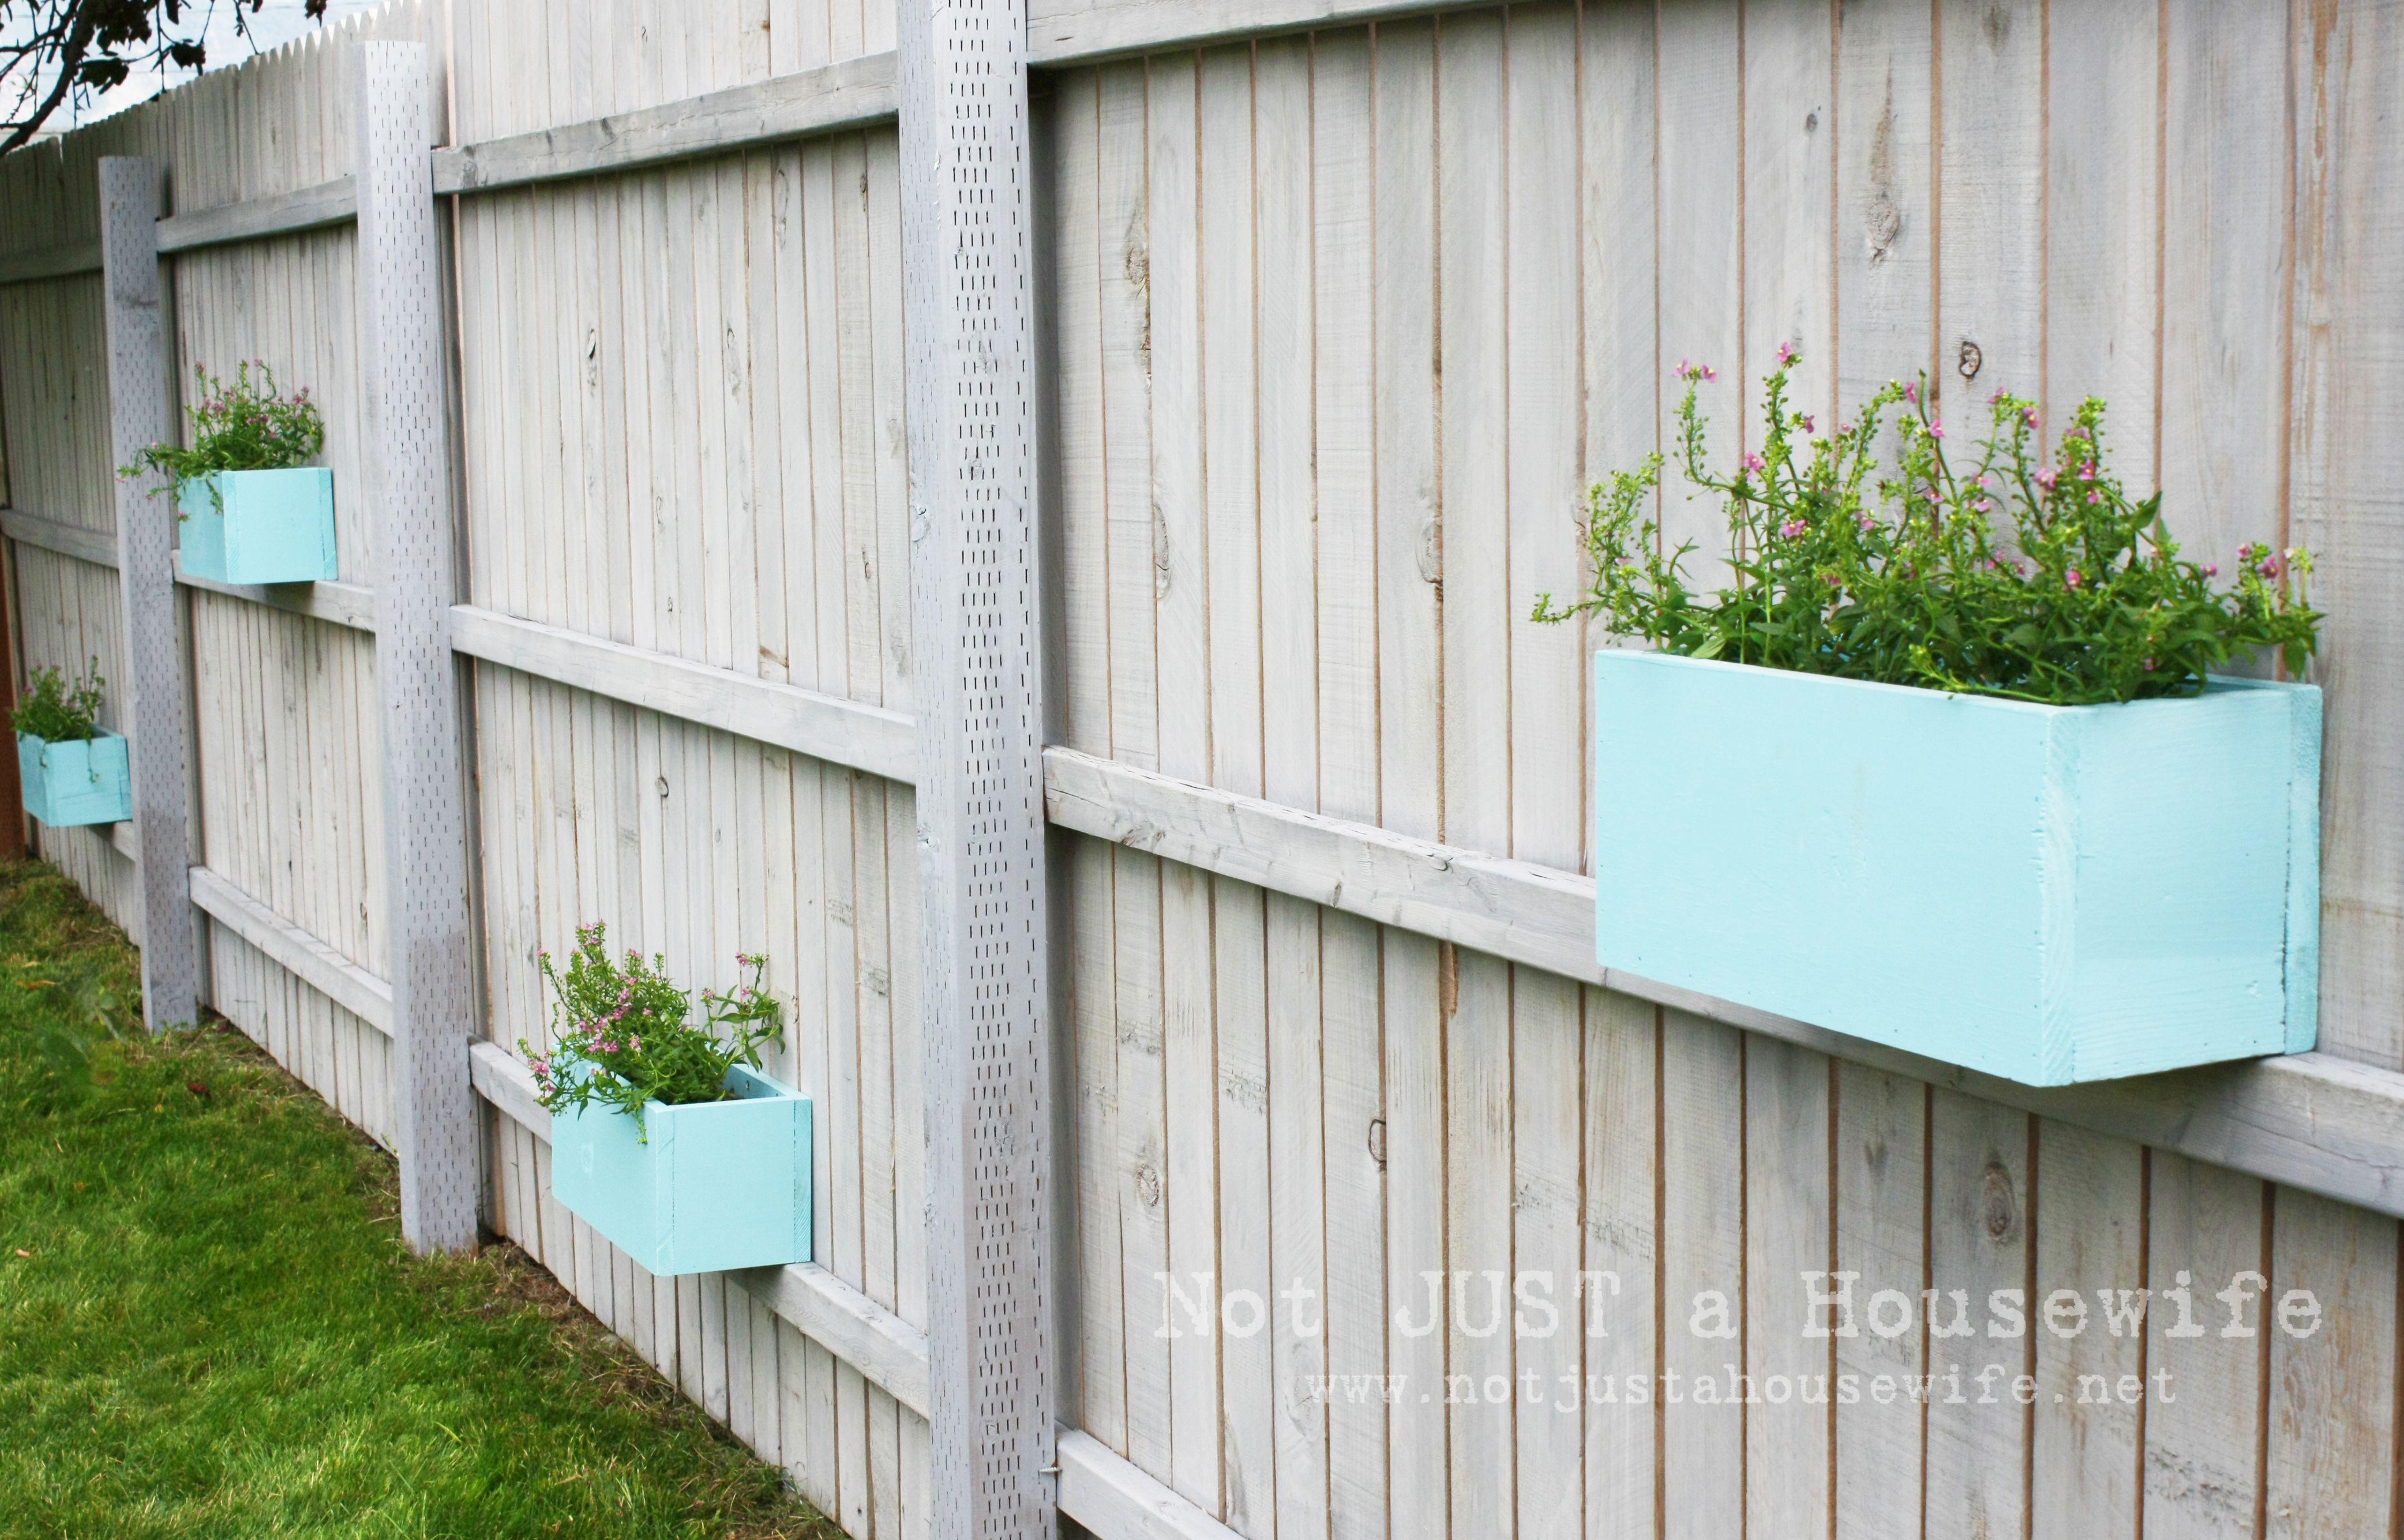 planter-box-on-fence